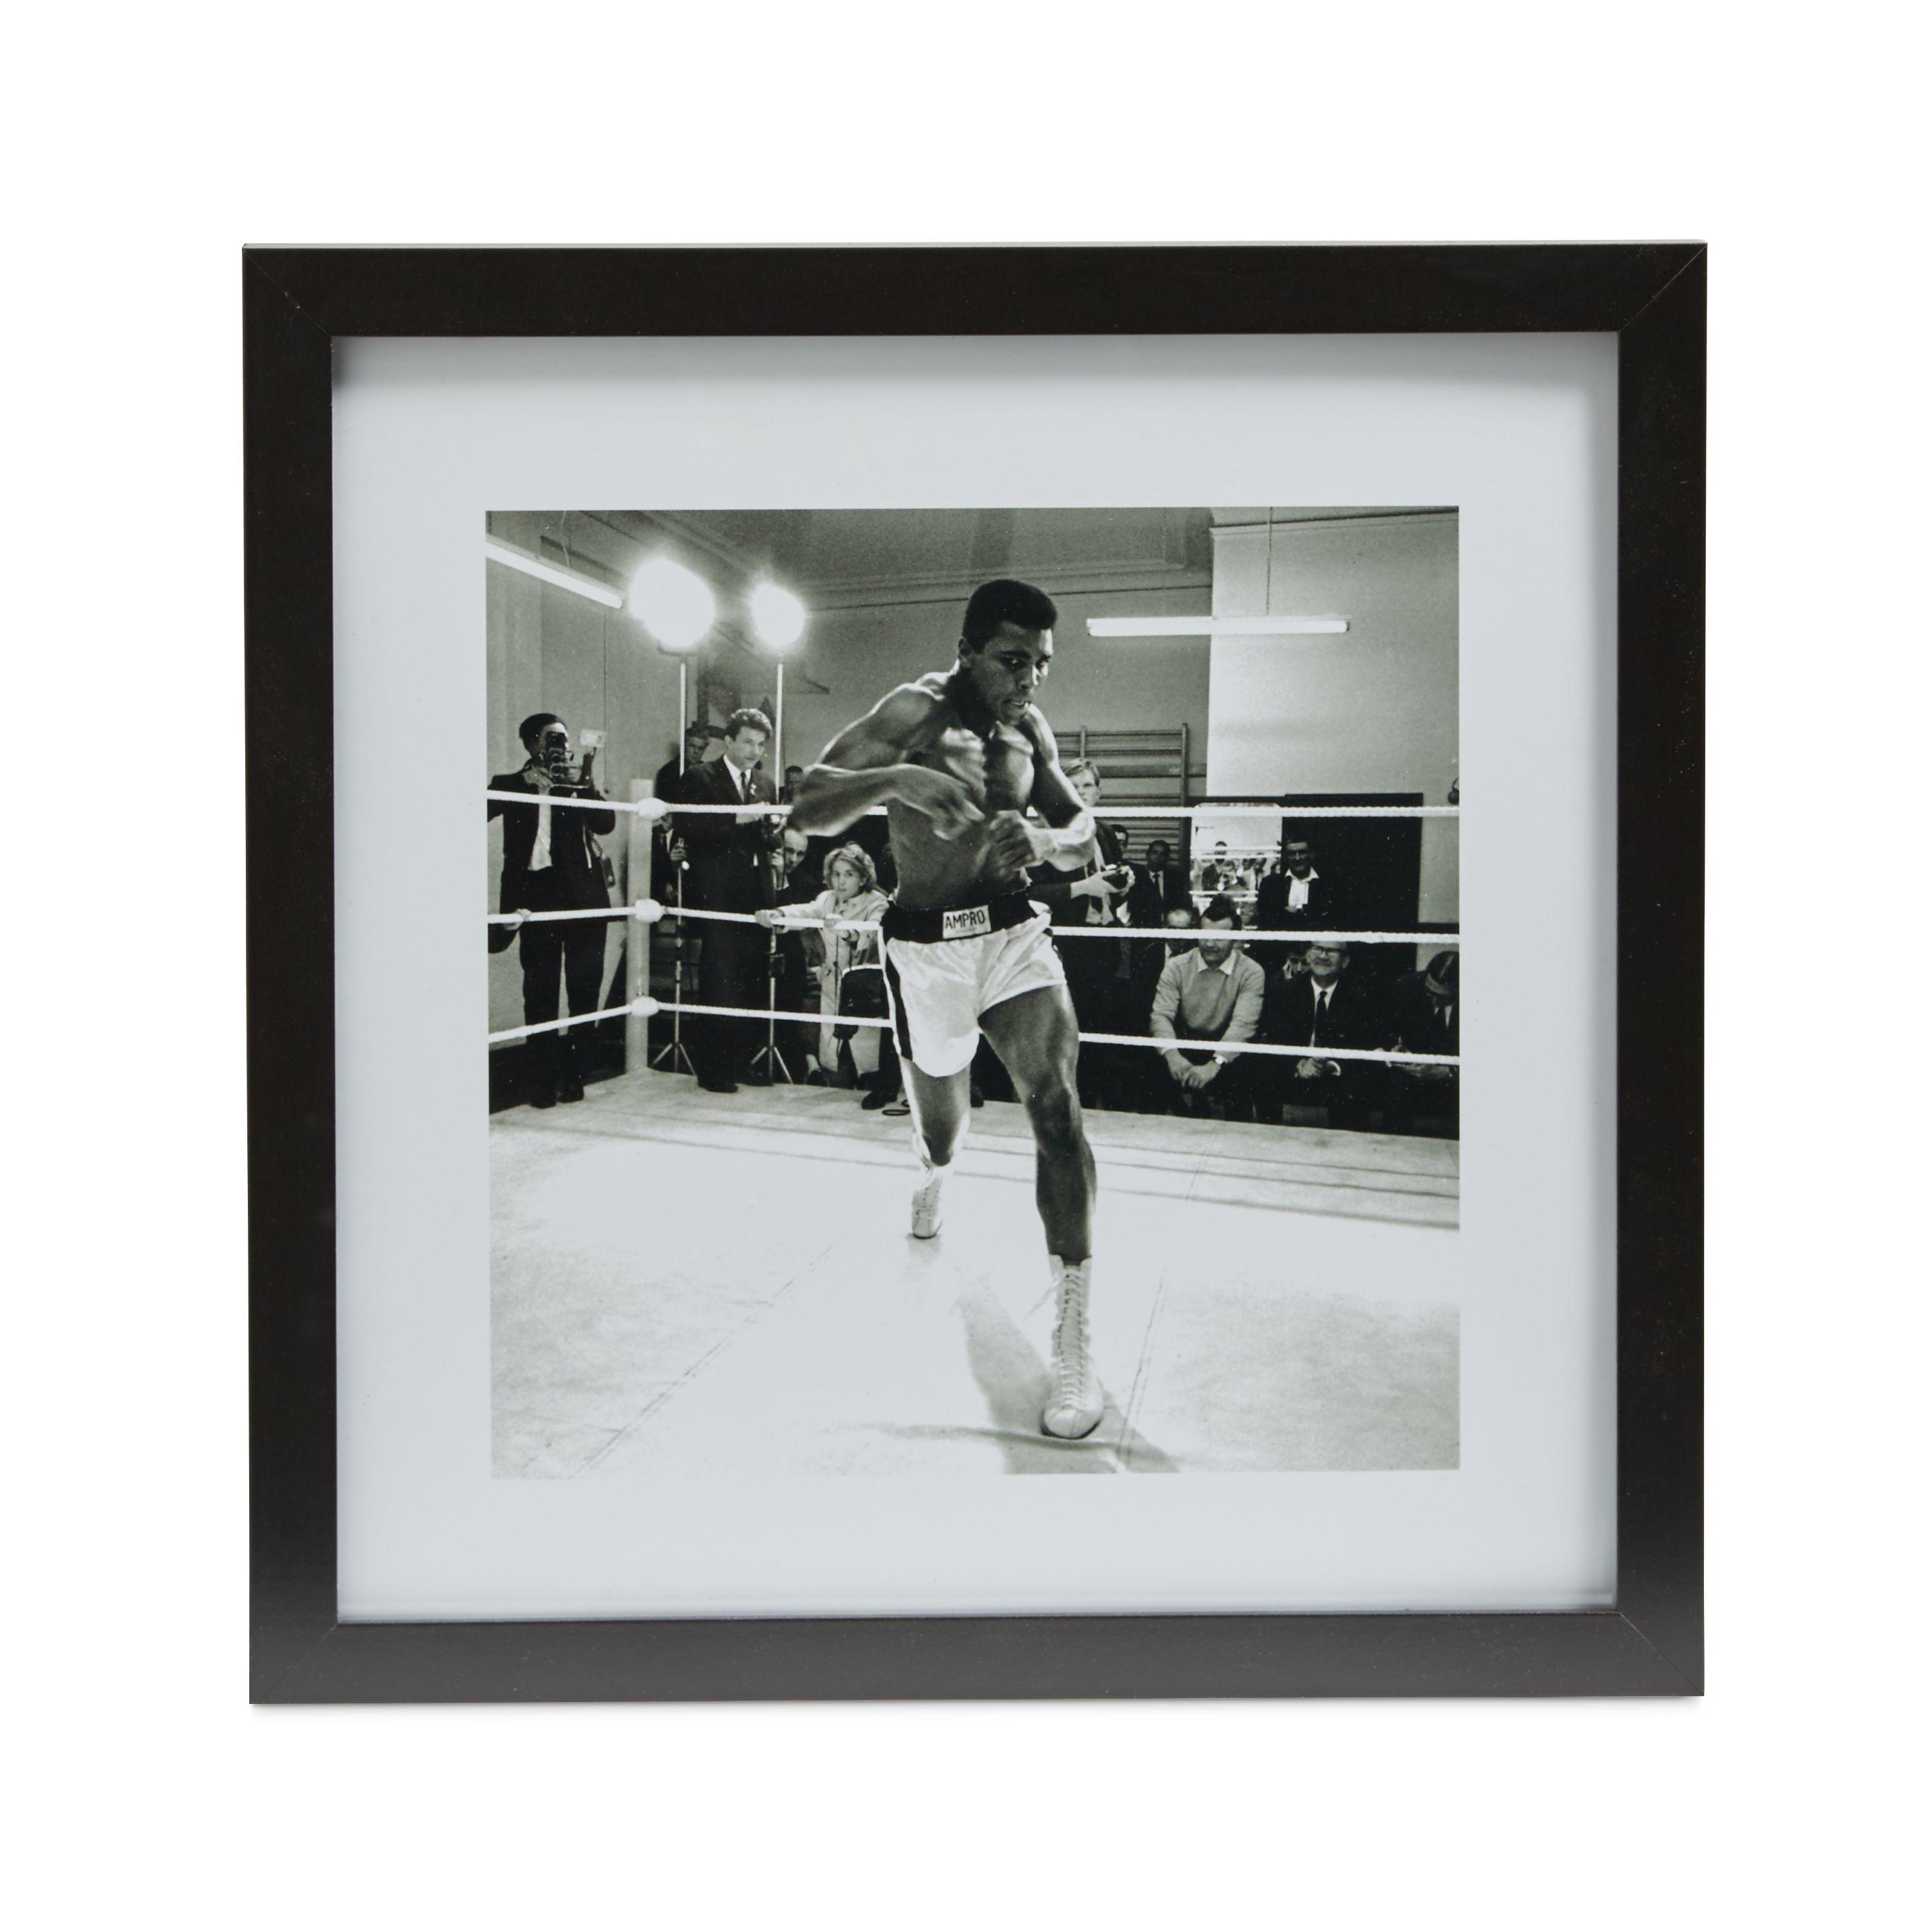 Ali Black Framed Print (w)340mm (h)340mm